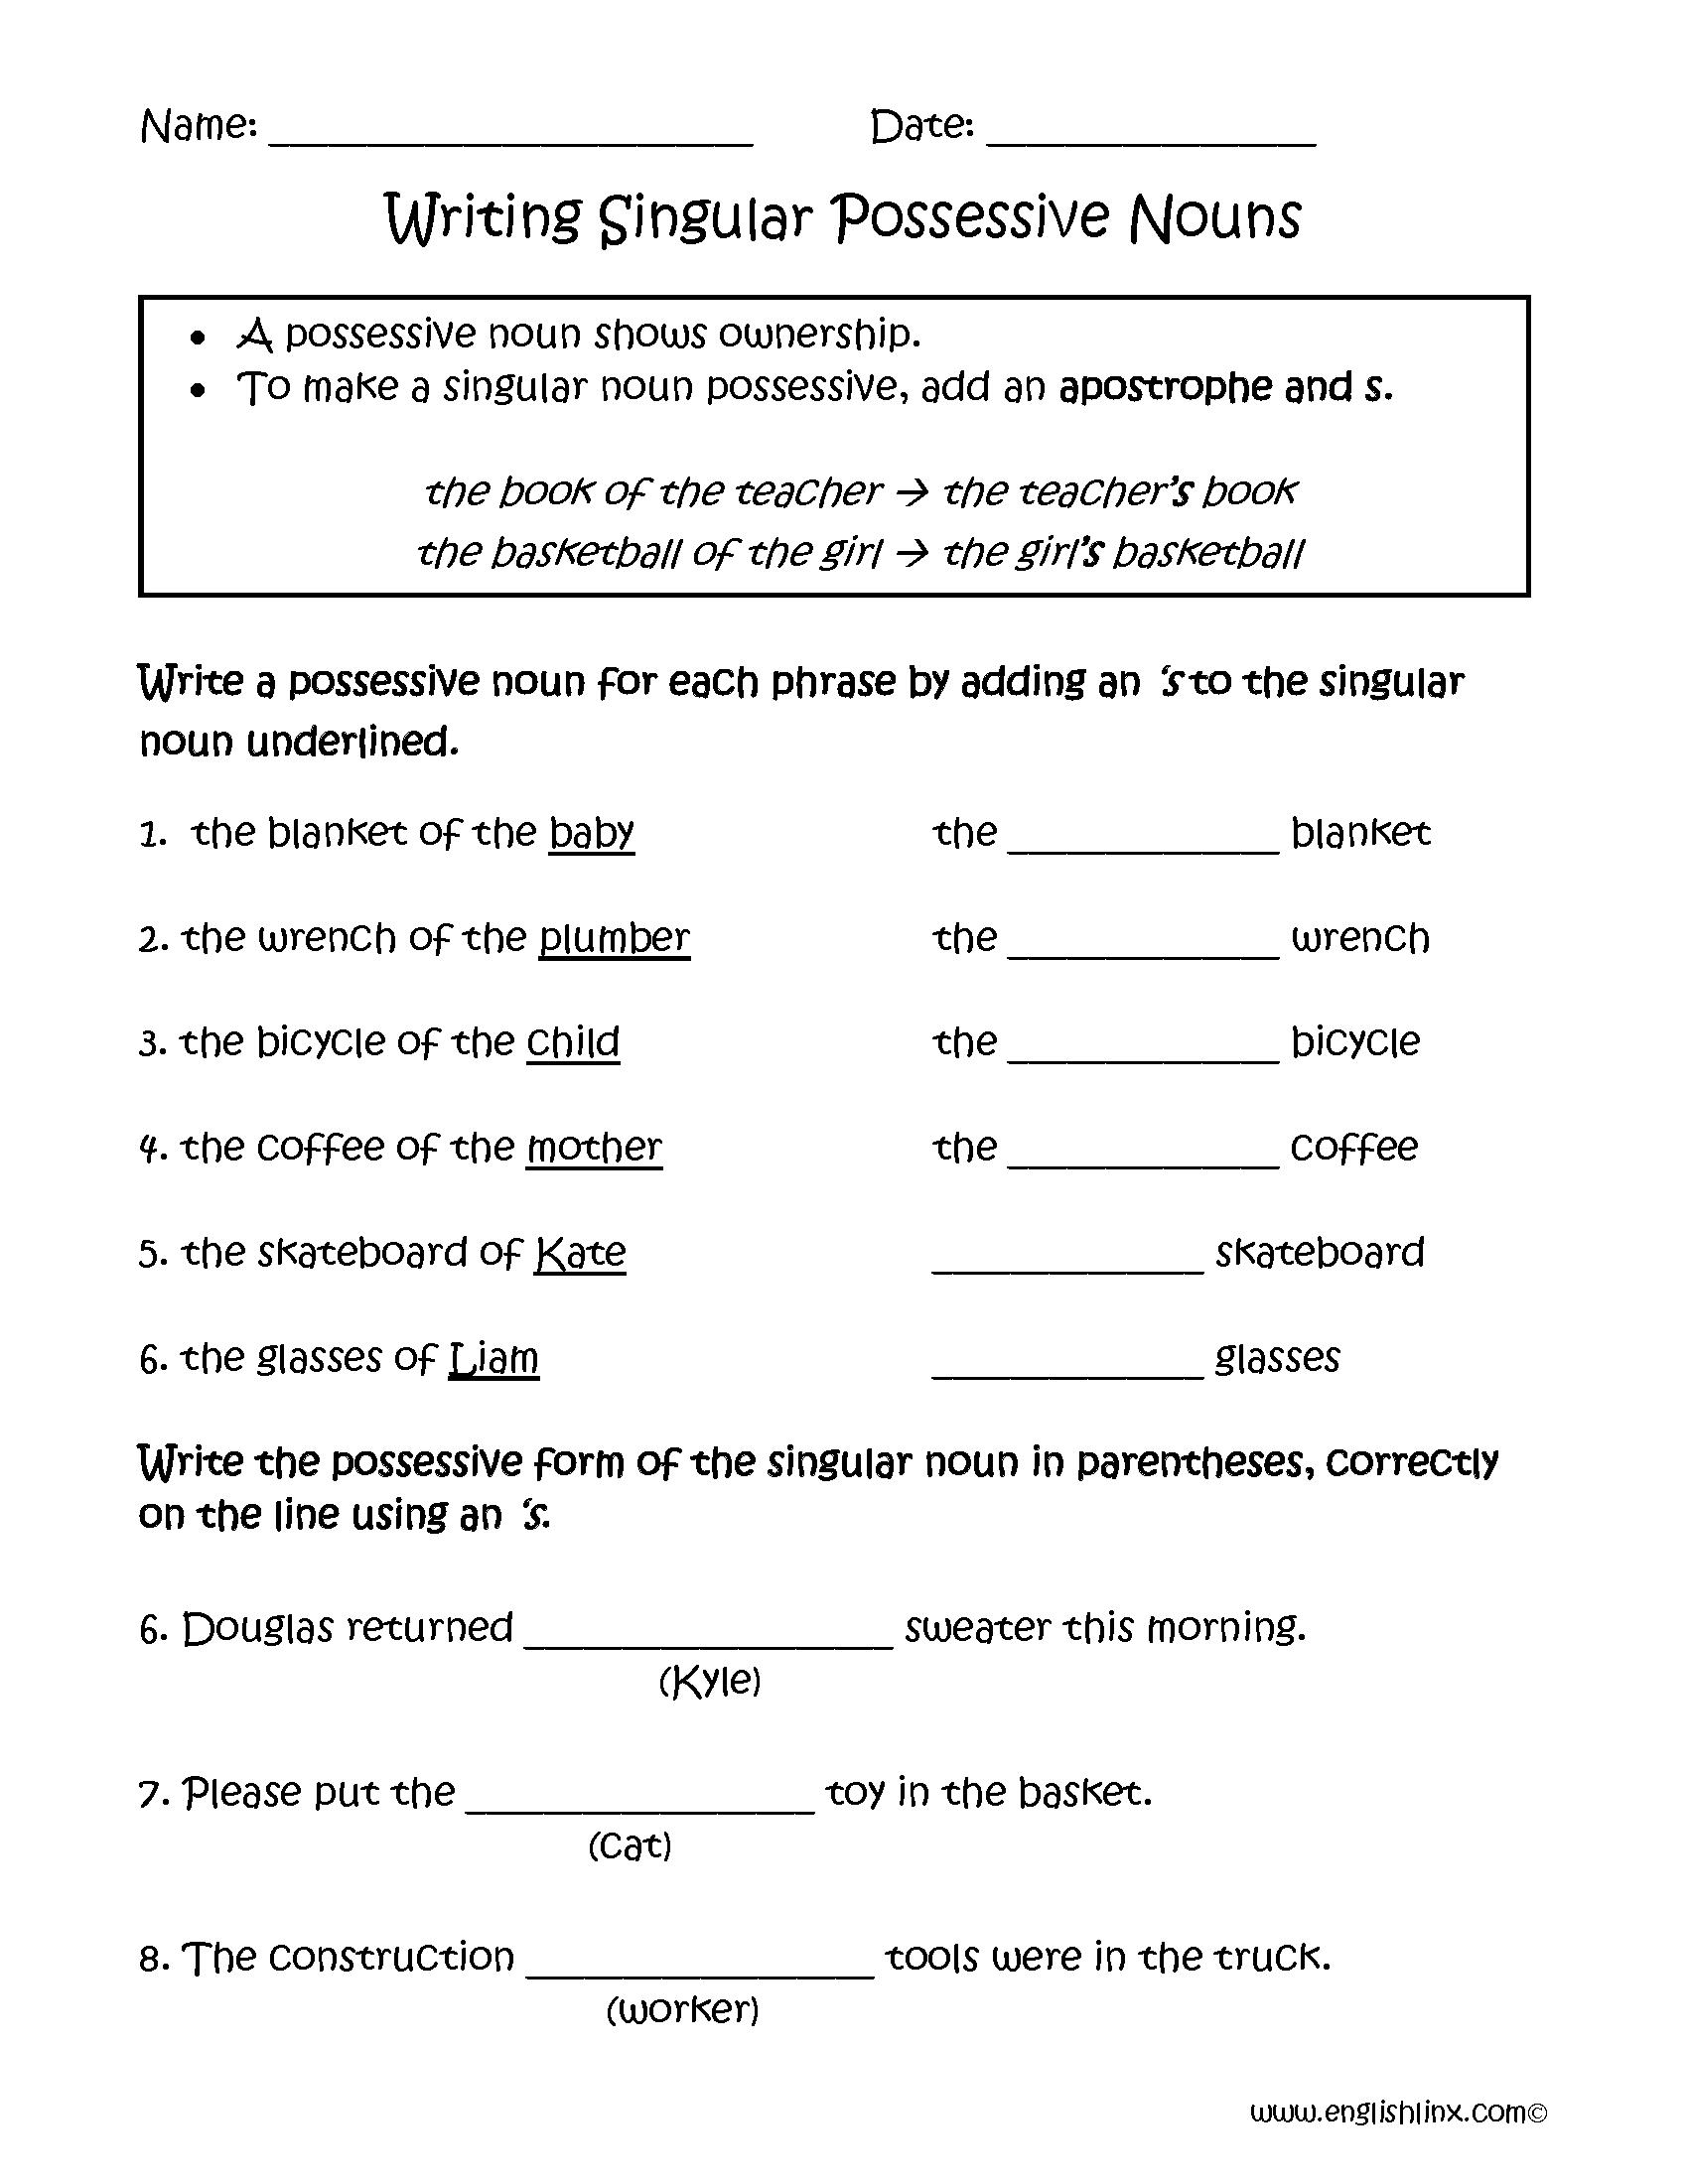 hight resolution of Possessive Nouns Worksheets   Writing Singular Possessive Nouns Worksheets